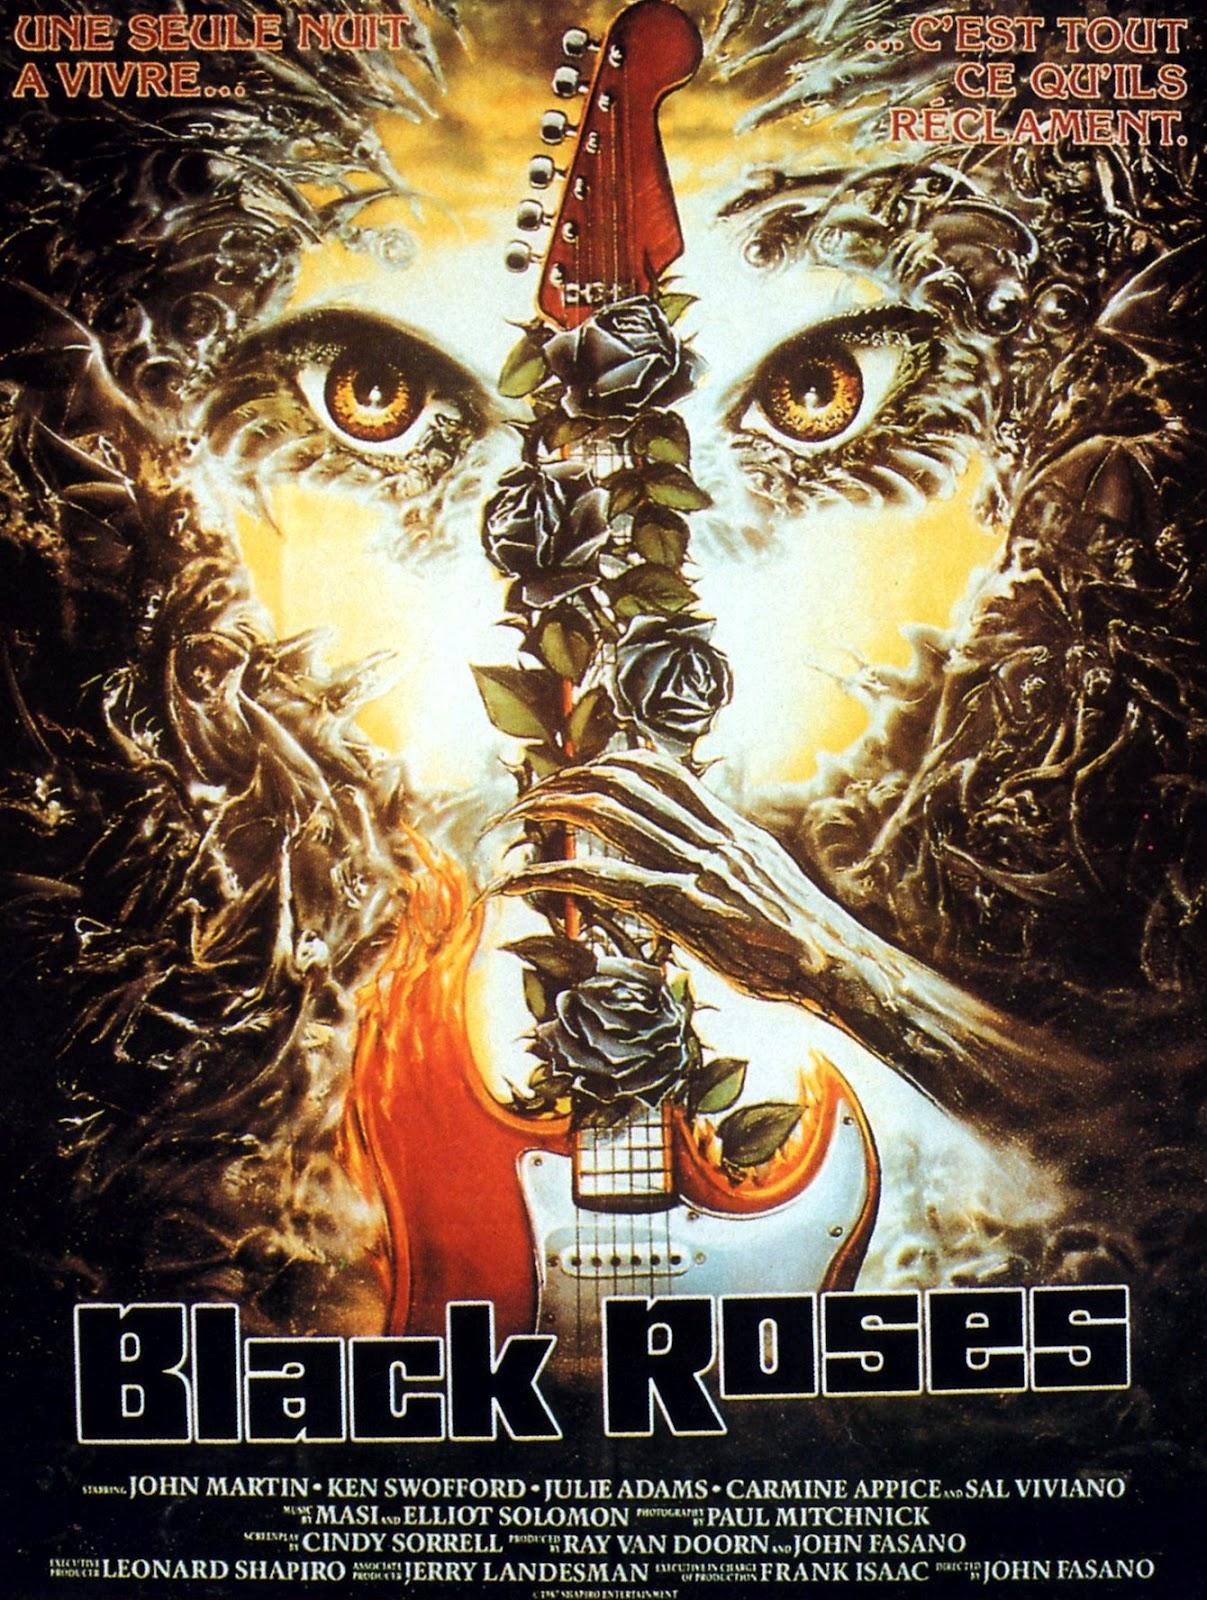 http://1.bp.blogspot.com/-1_RAAPu2r5o/T7AI8e2zTDI/AAAAAAAAN0o/dKlE-8Ph5dA/s1600/1988+-+Black+Roses+-+John+Fasano+-+tt0094752.jpg